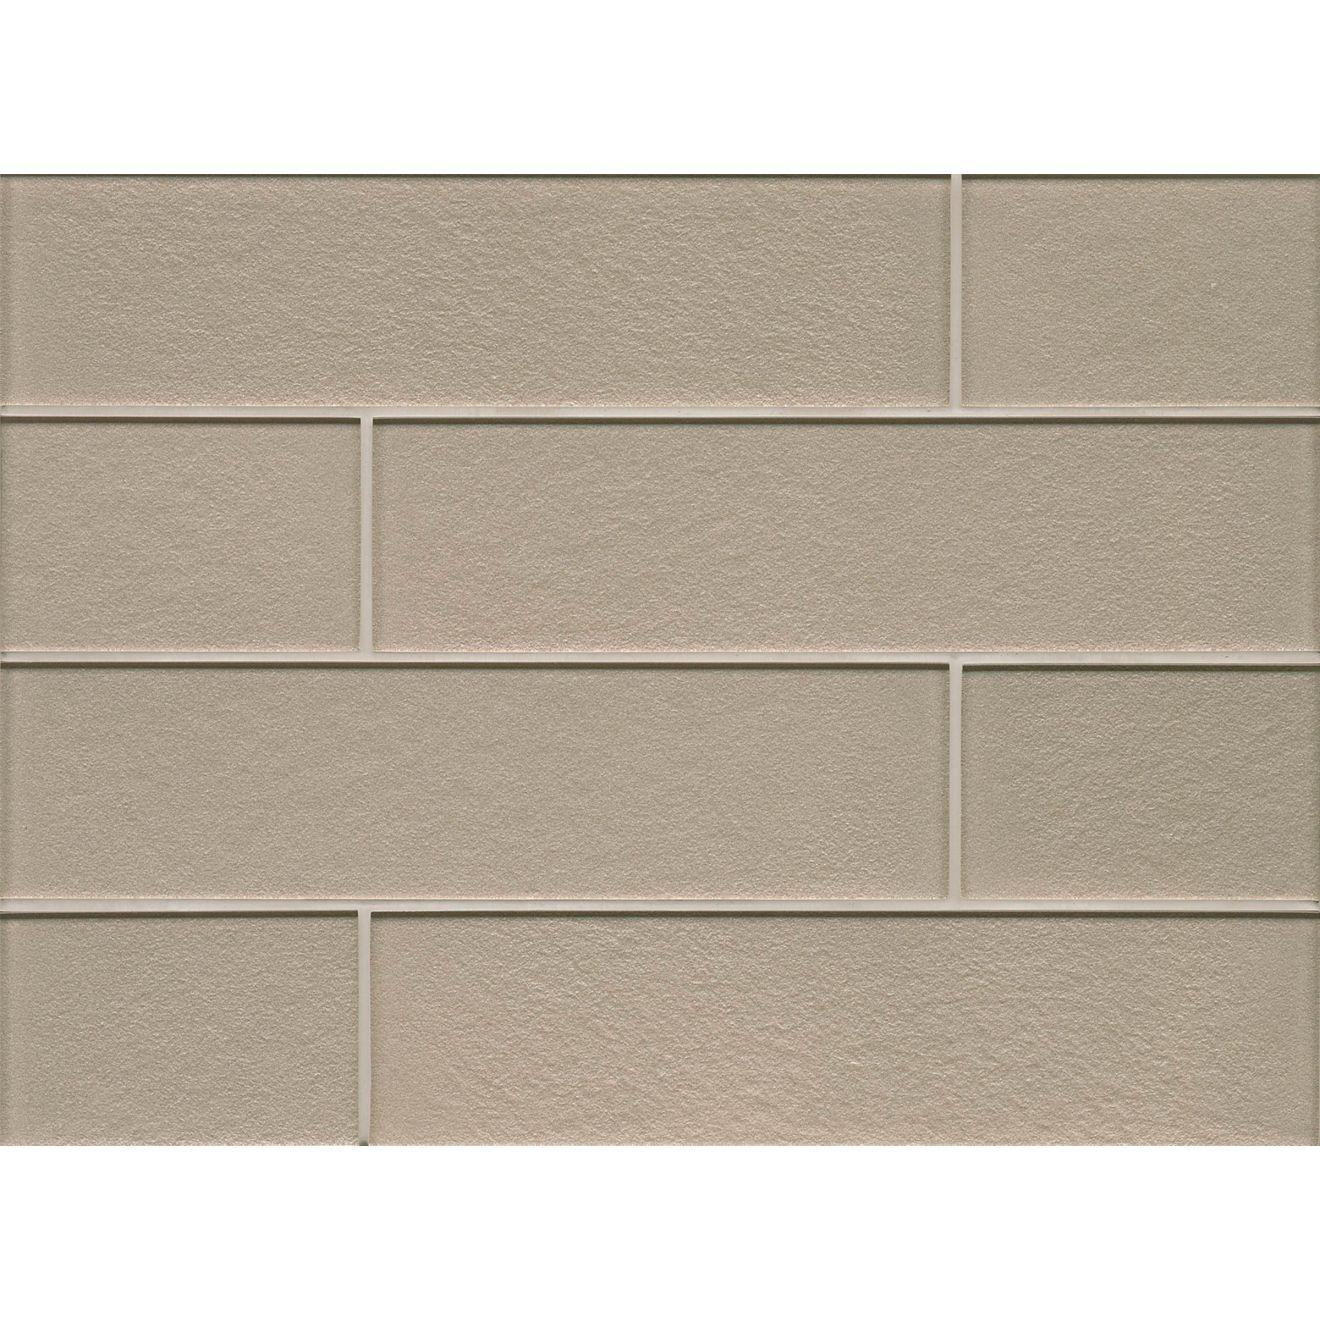 "Manhattan 4"" x 16"" Wall Tile in Silk"